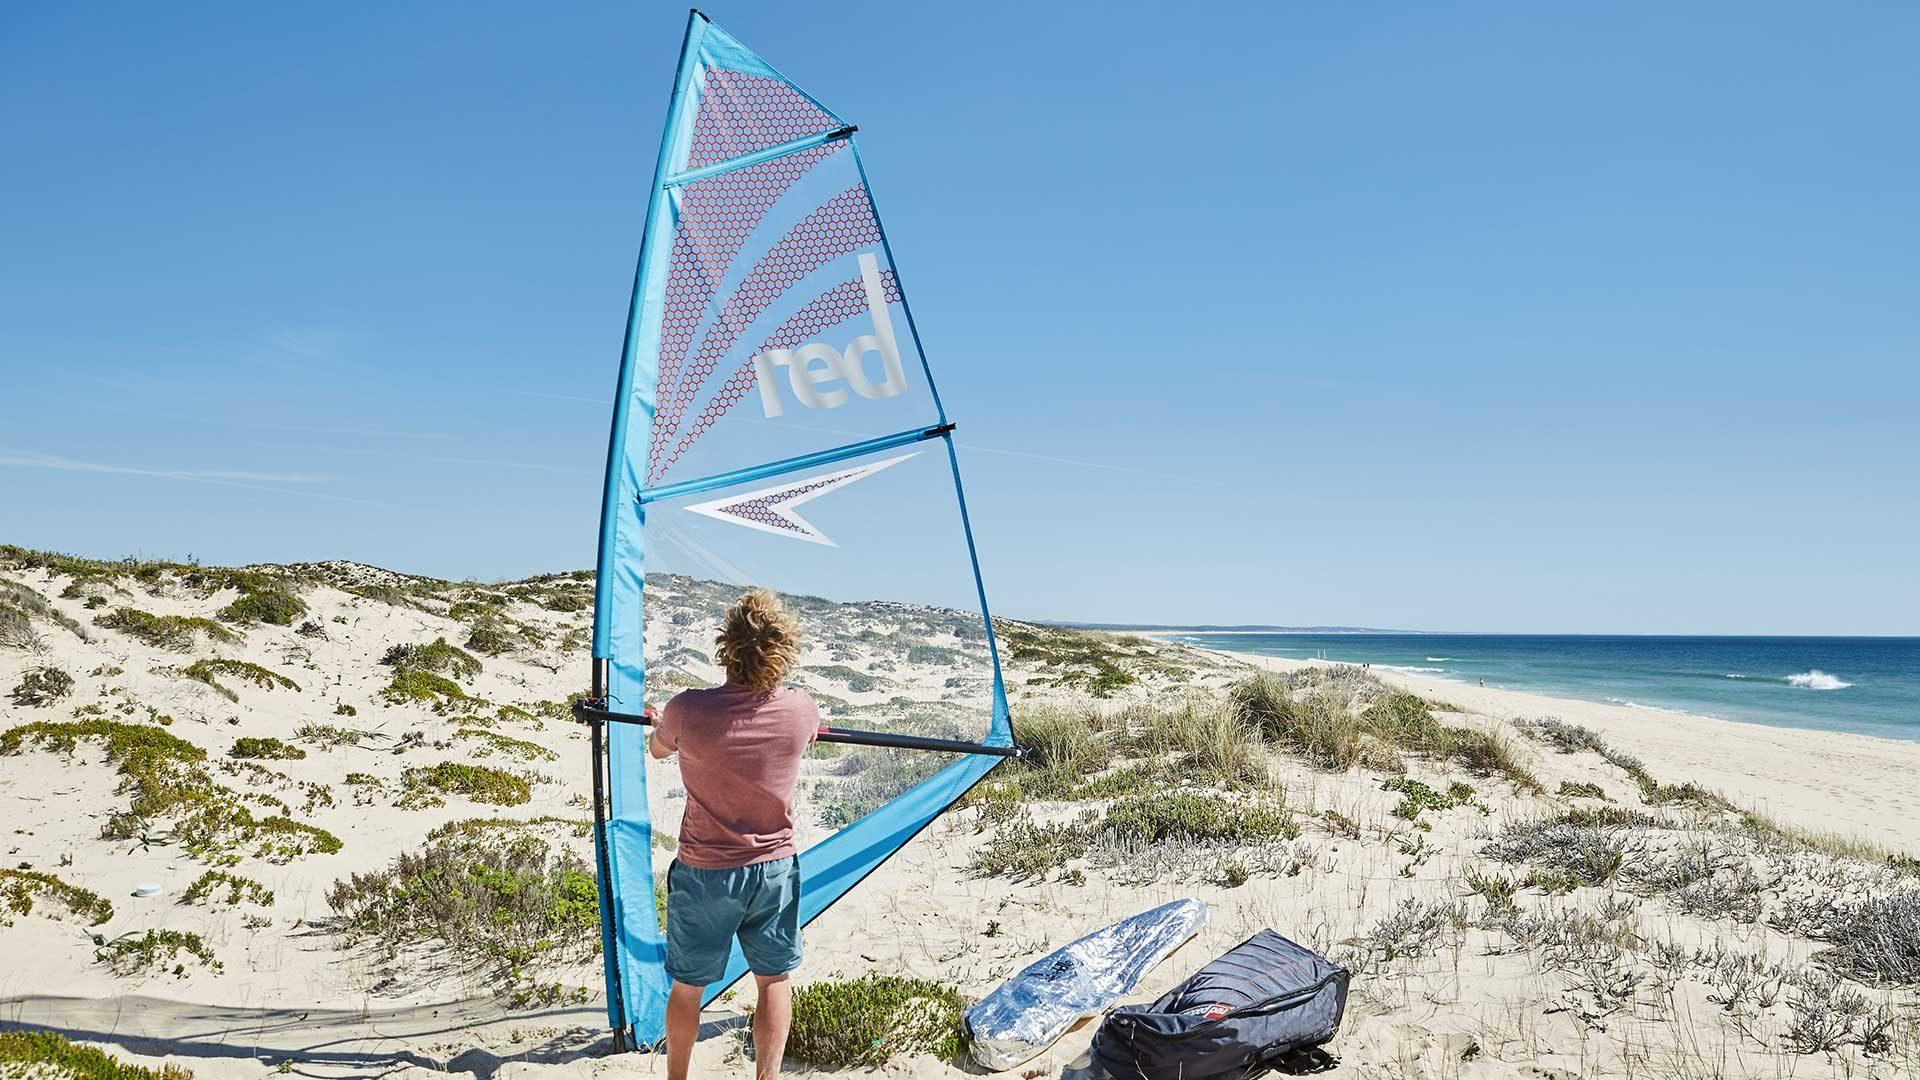 redpaddleco-107-windsurf-inflatable-paddle-board-desktop-gallery-valve